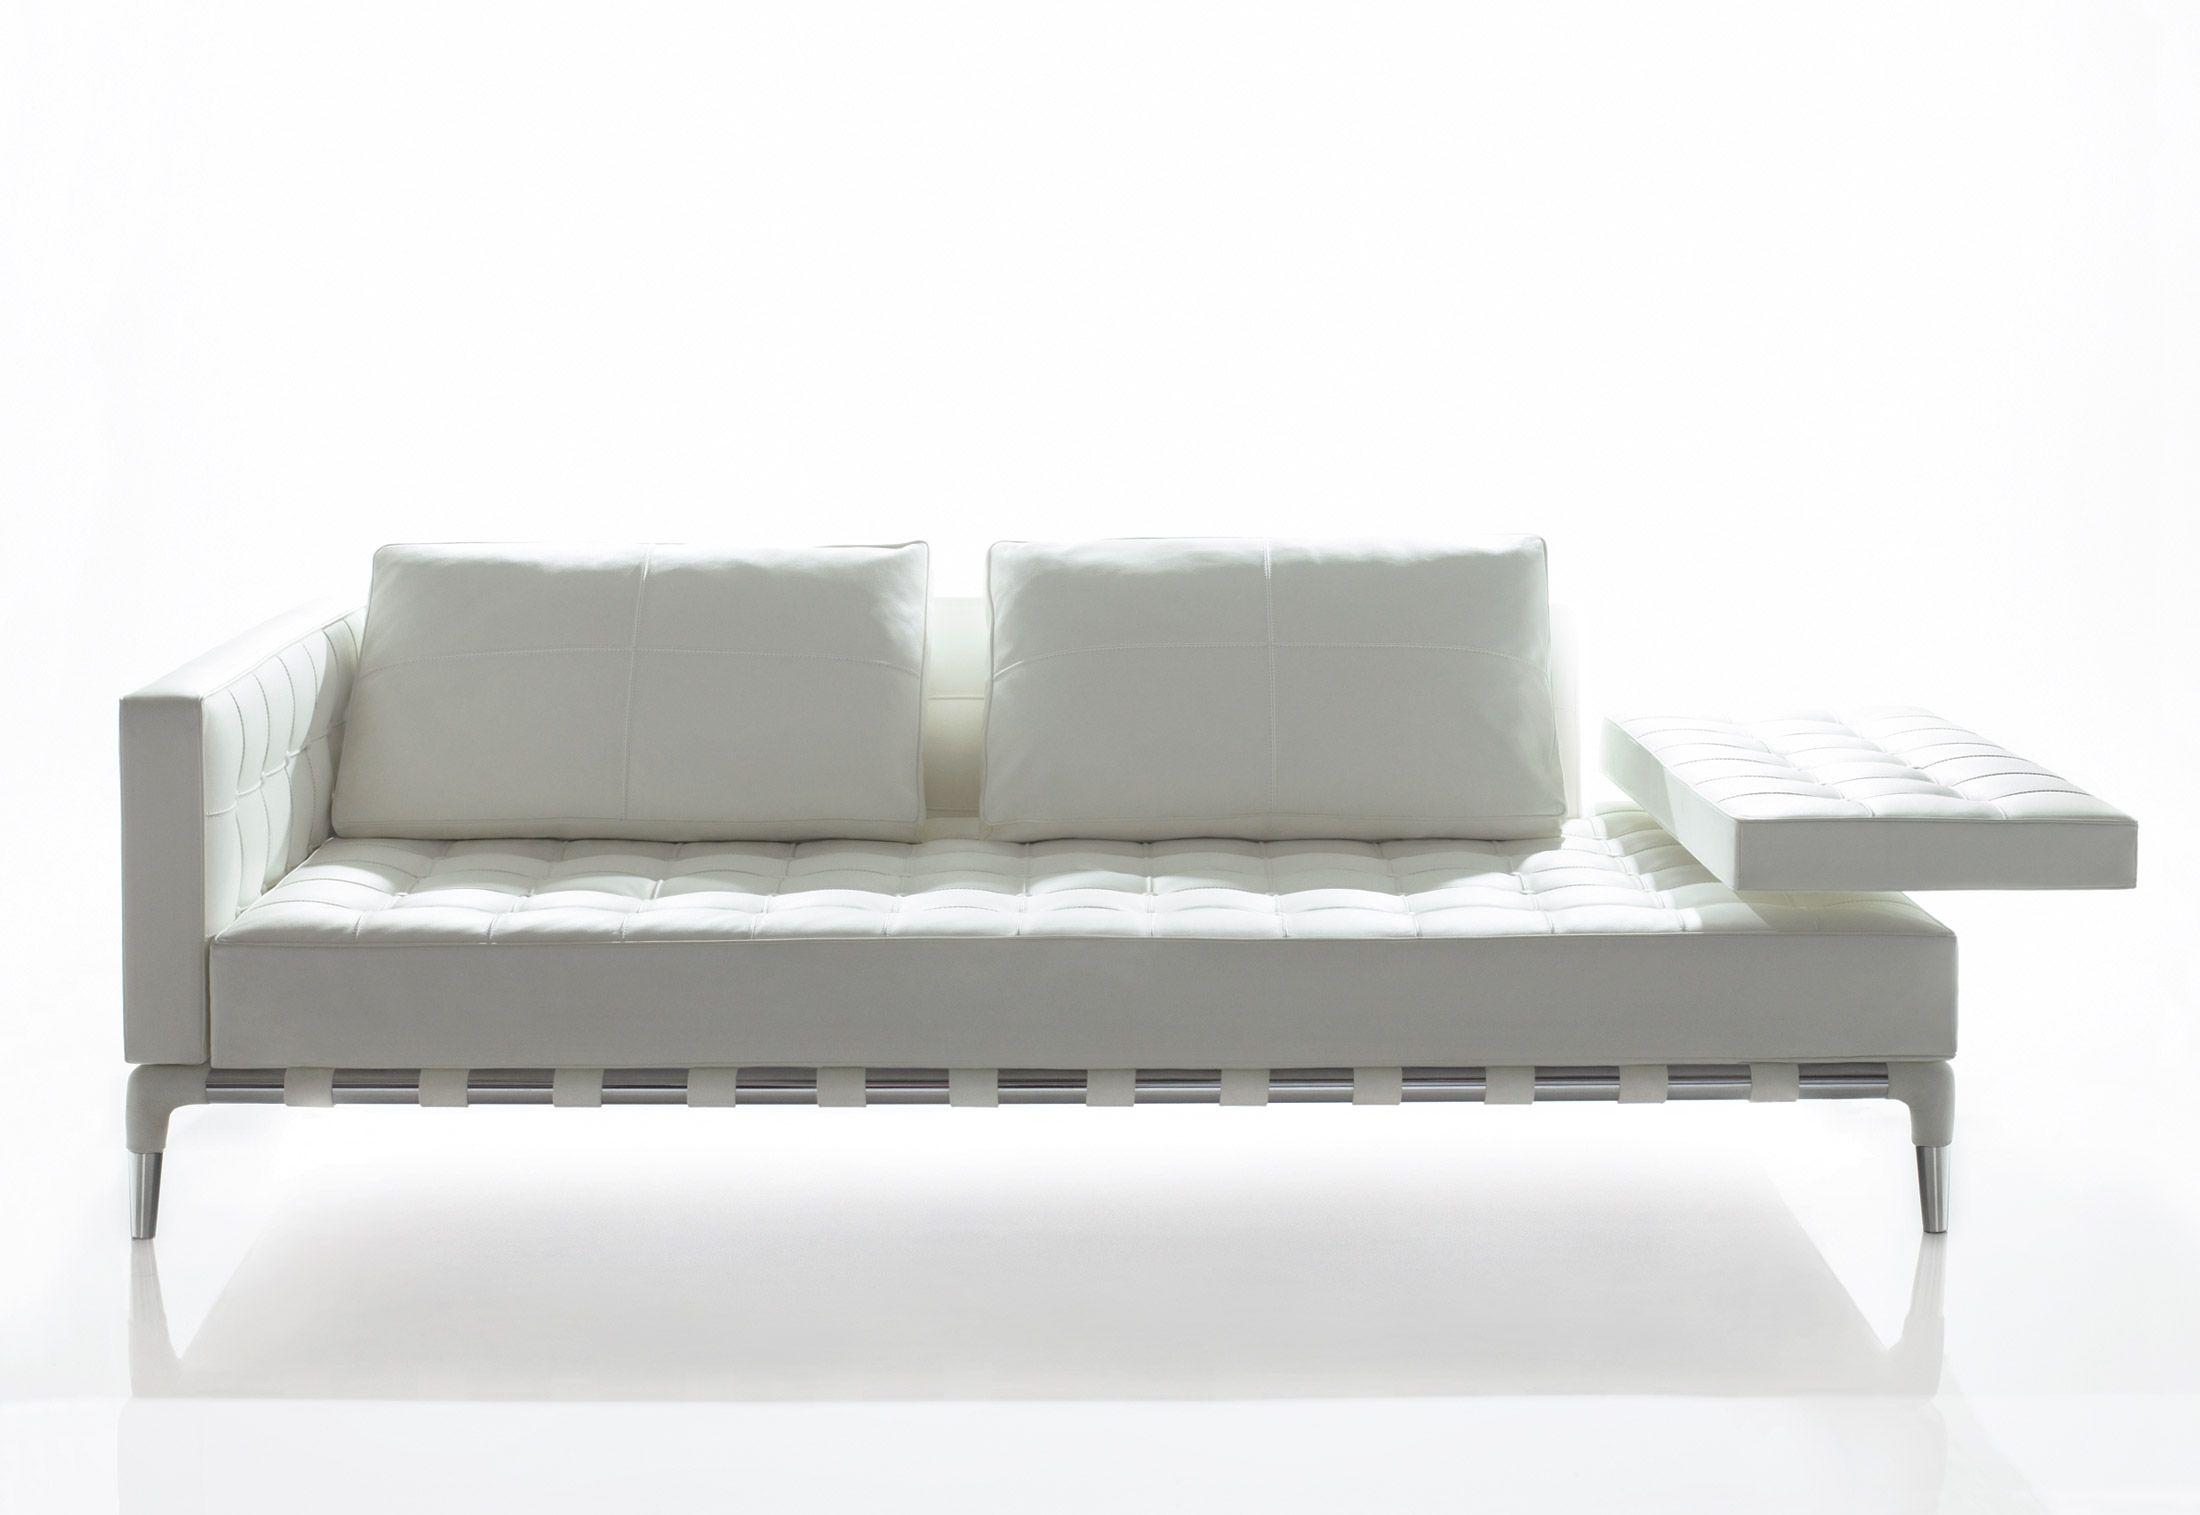 Prive Sofa Philippe Starck 2007 Cassina Modern White Couch